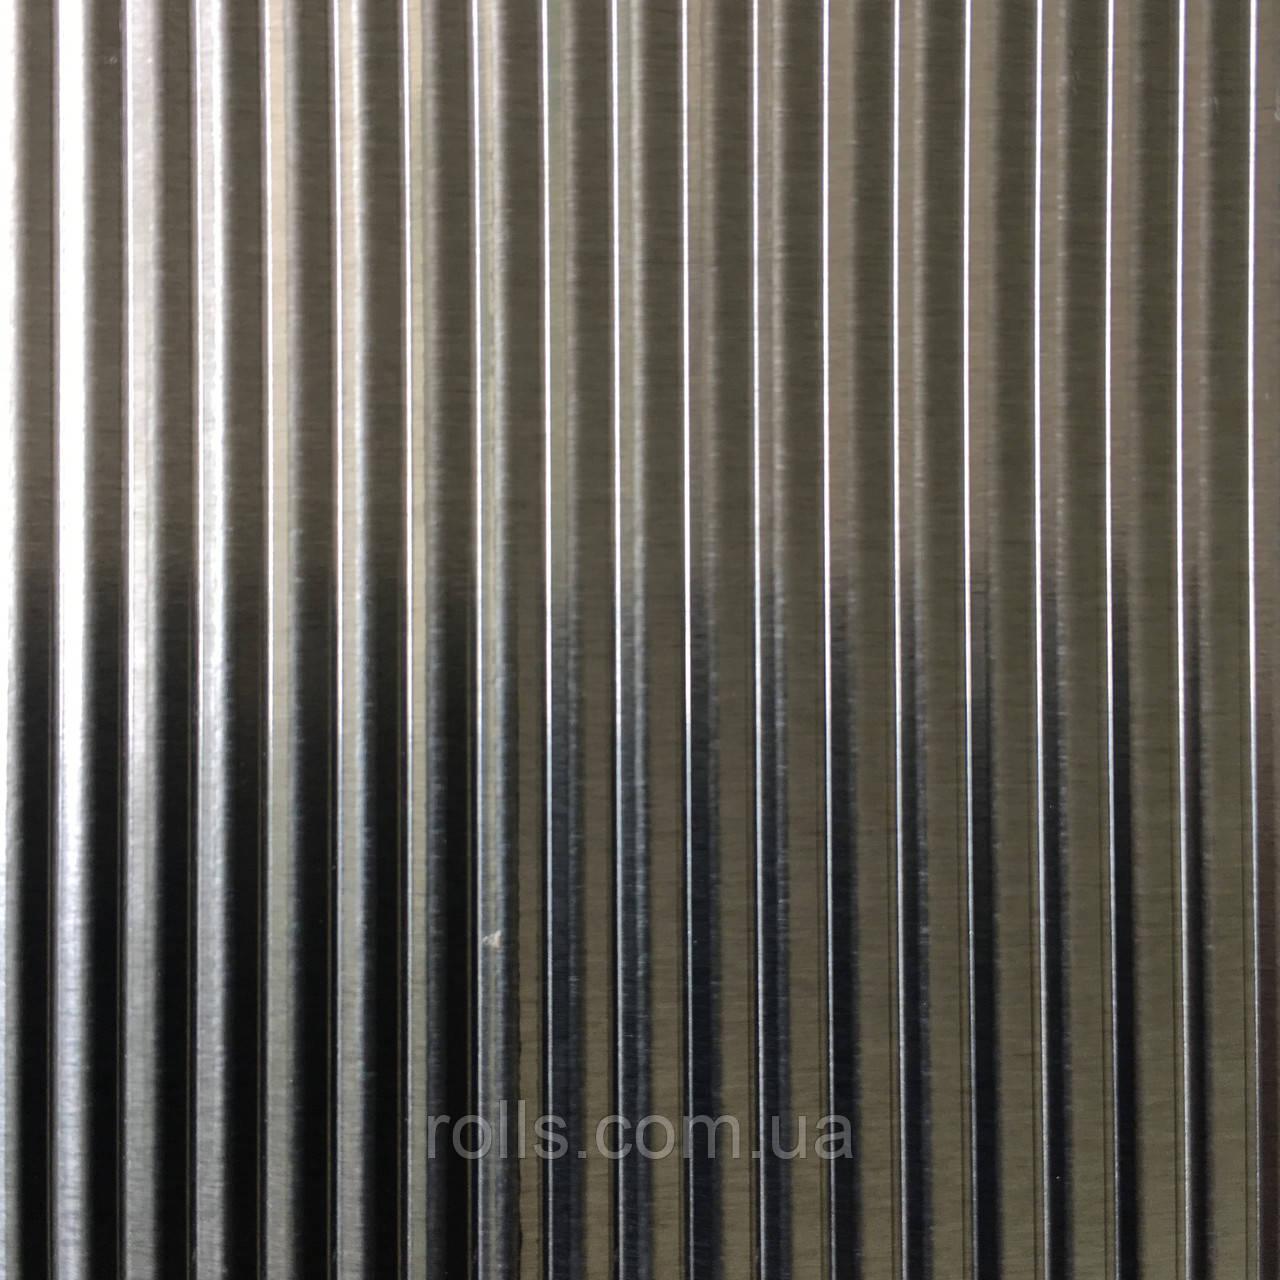 Лист рифленый алюминиевый 1,0х1000х2000мм PREFA DESIGN 921 WAVE CROSS 5mm WELLE QUER